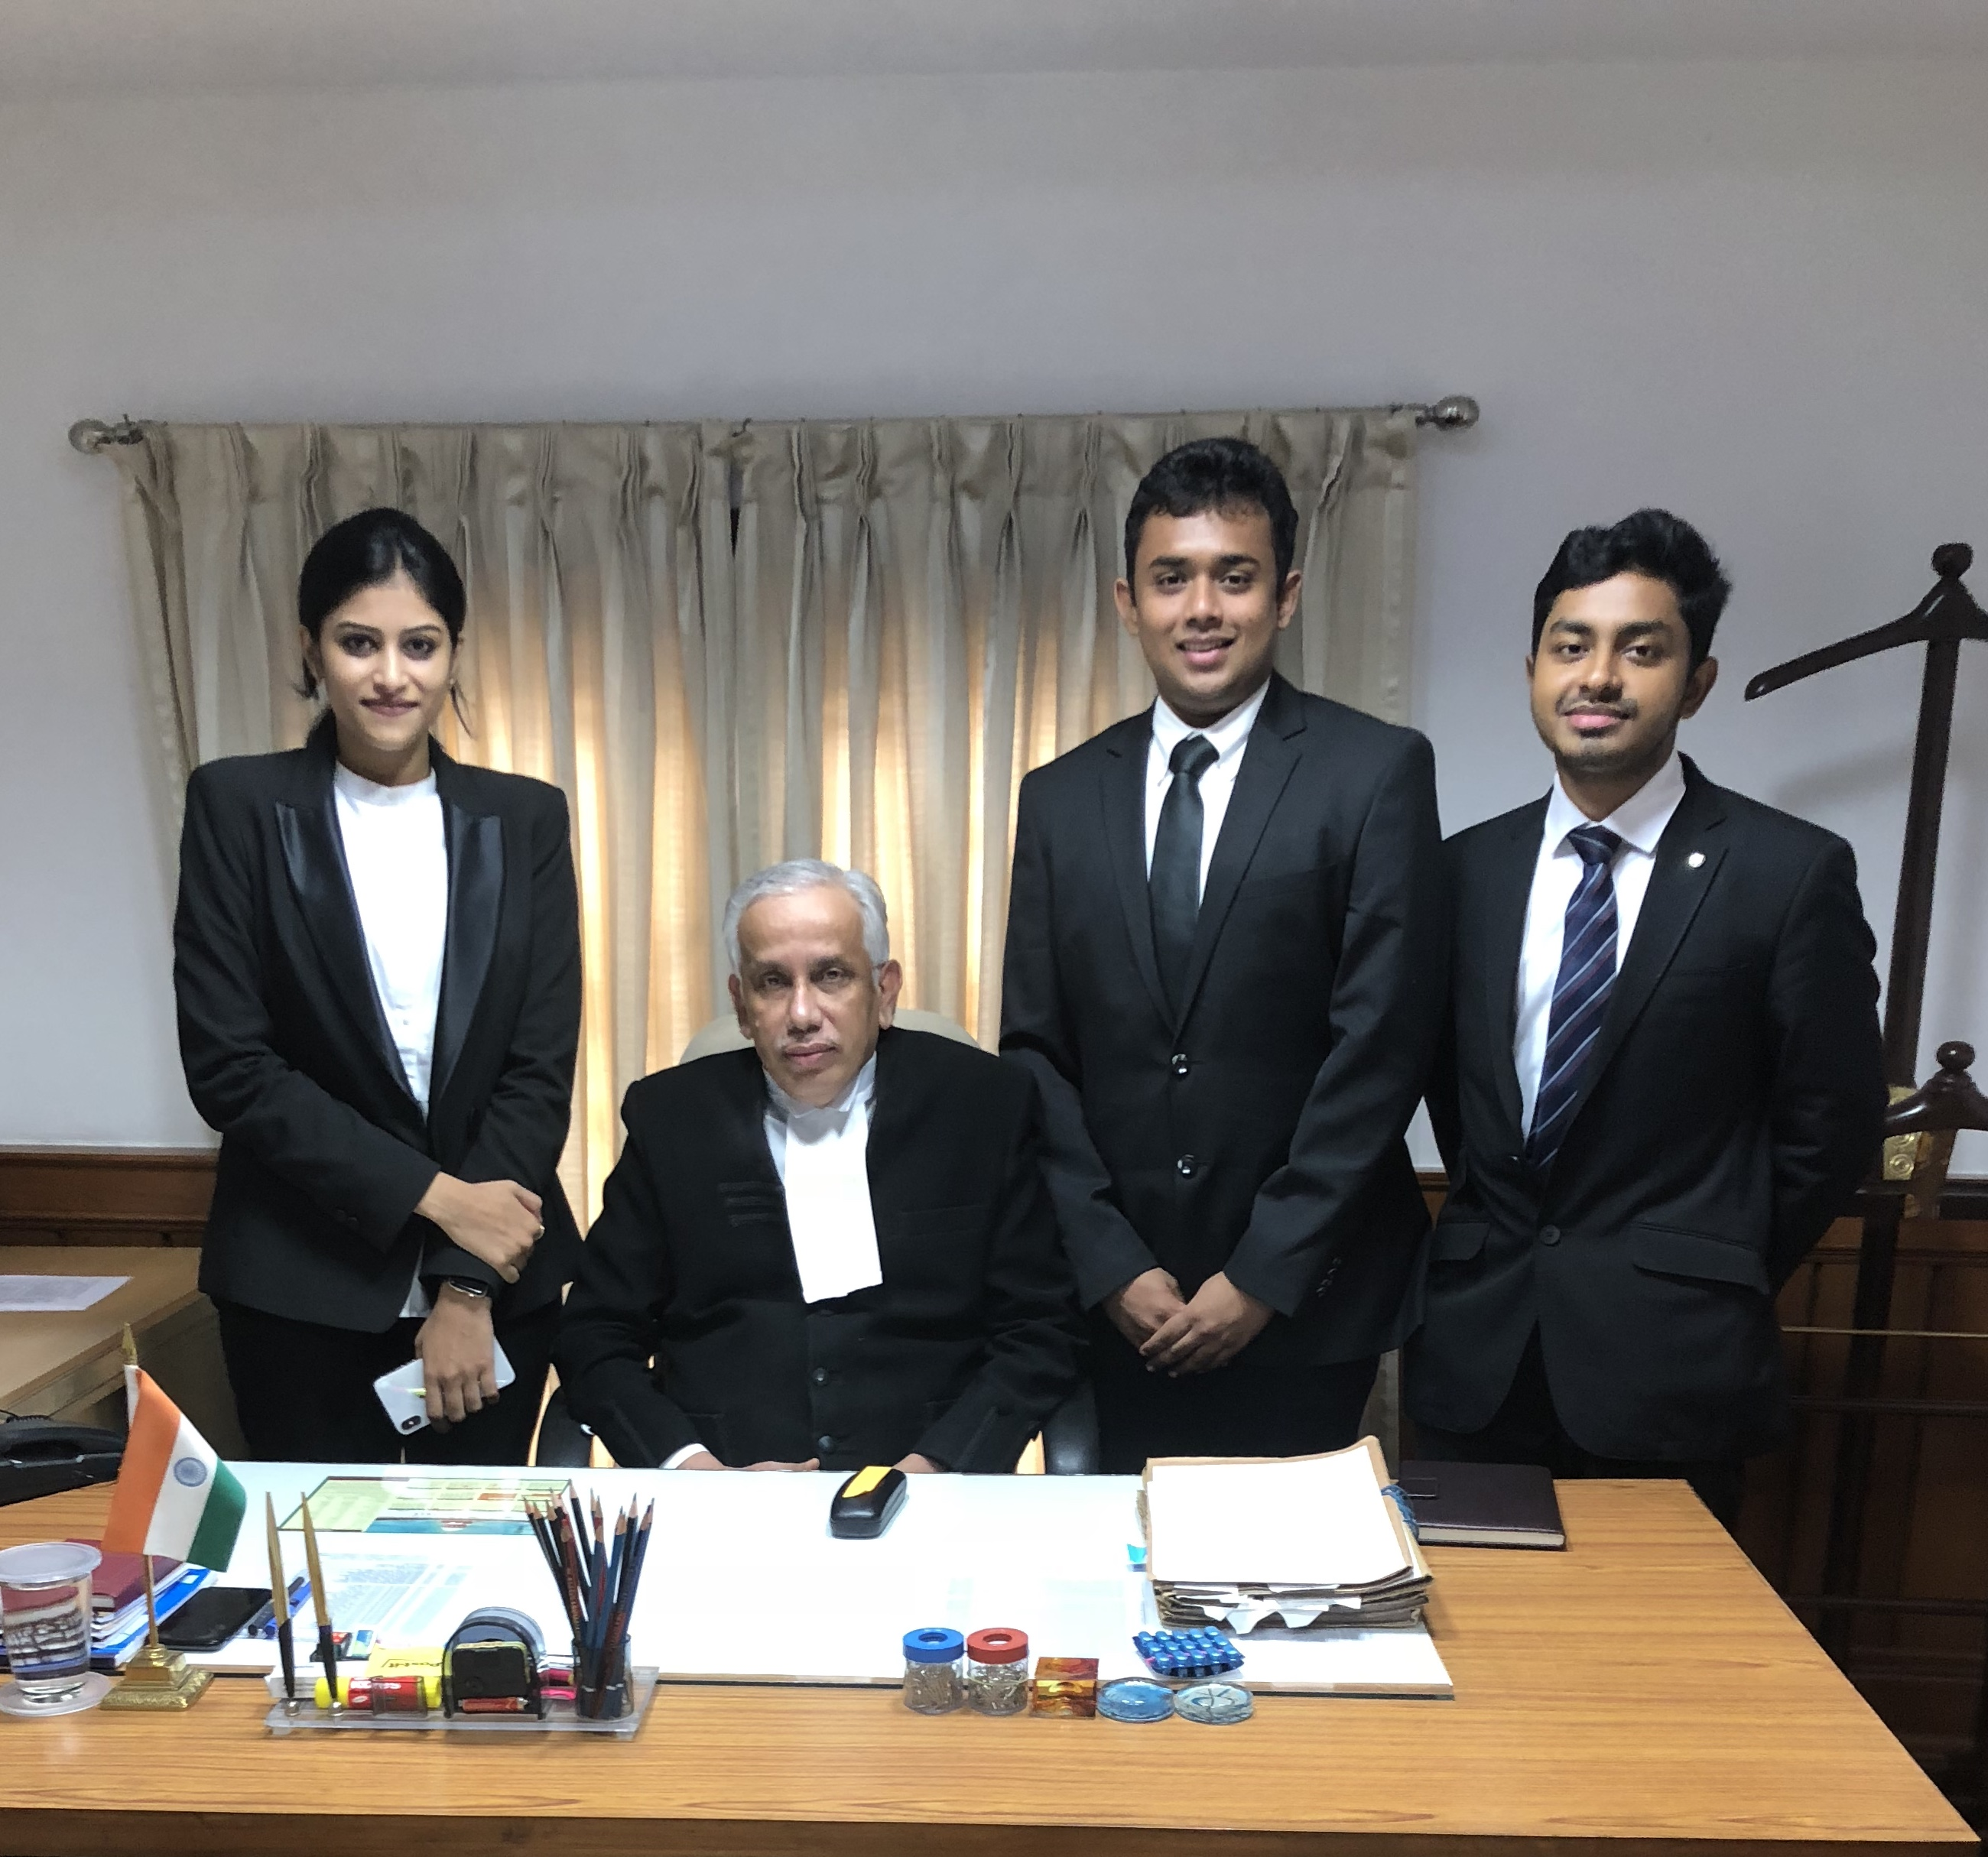 Internship Experience @ Hon'ble Justice Abdul Nazeer, Delhi: Preparing Case Briefs, Research Work,